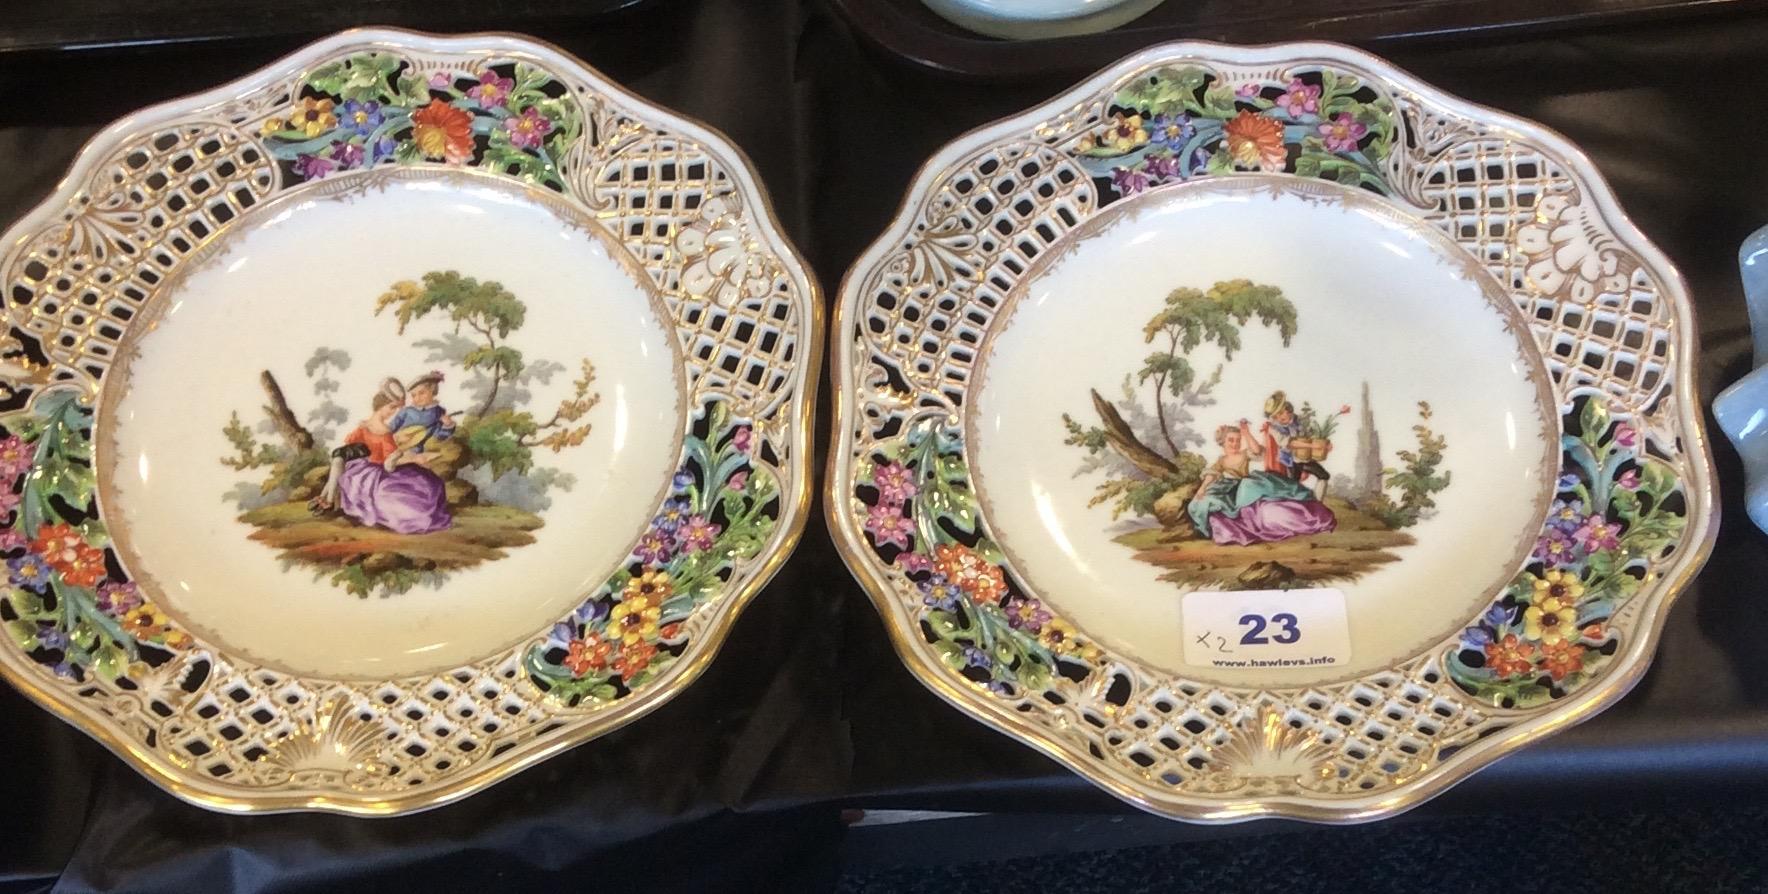 Lot 23 - Pair of Meissen porcelain plates slight a/f to glaze.20cms diameter.